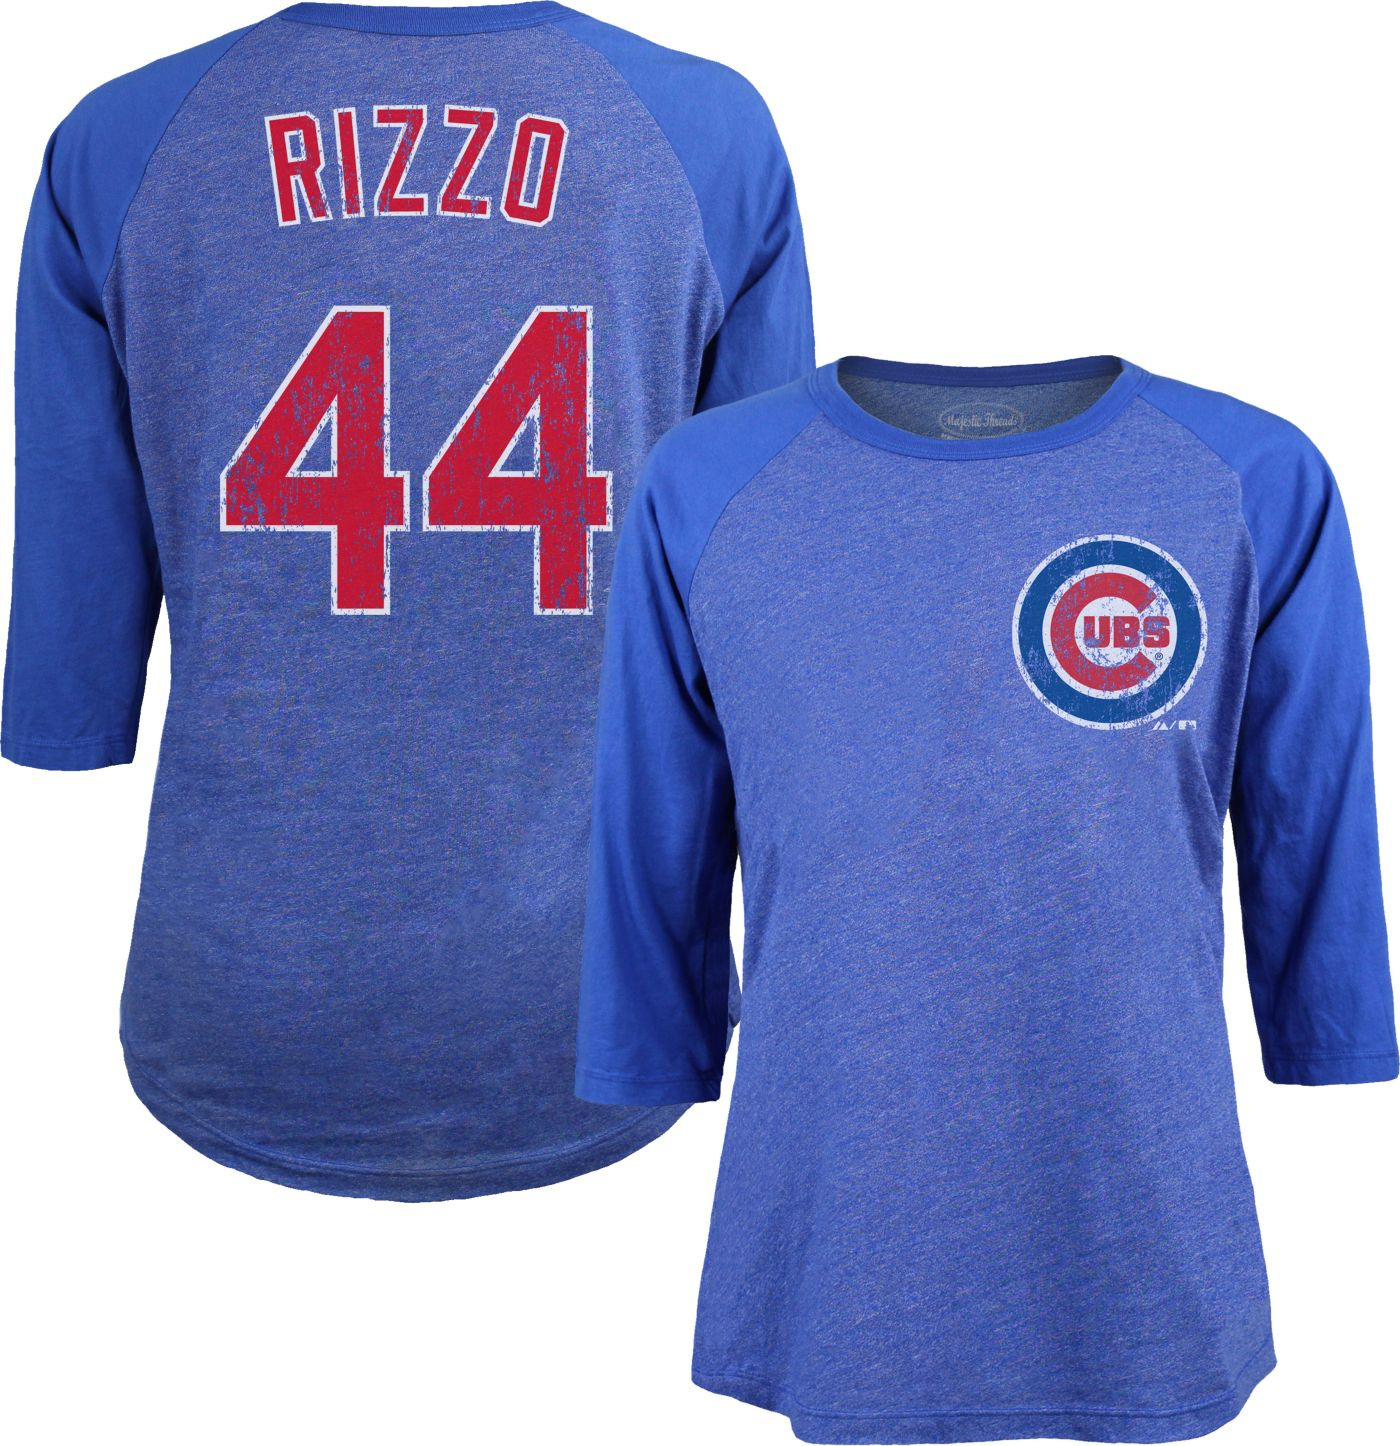 Majestic Threads Women's Chicago Cubs Anthony Rizzo #44 Raglan Royal Three-Quarter Sleeve Shirt